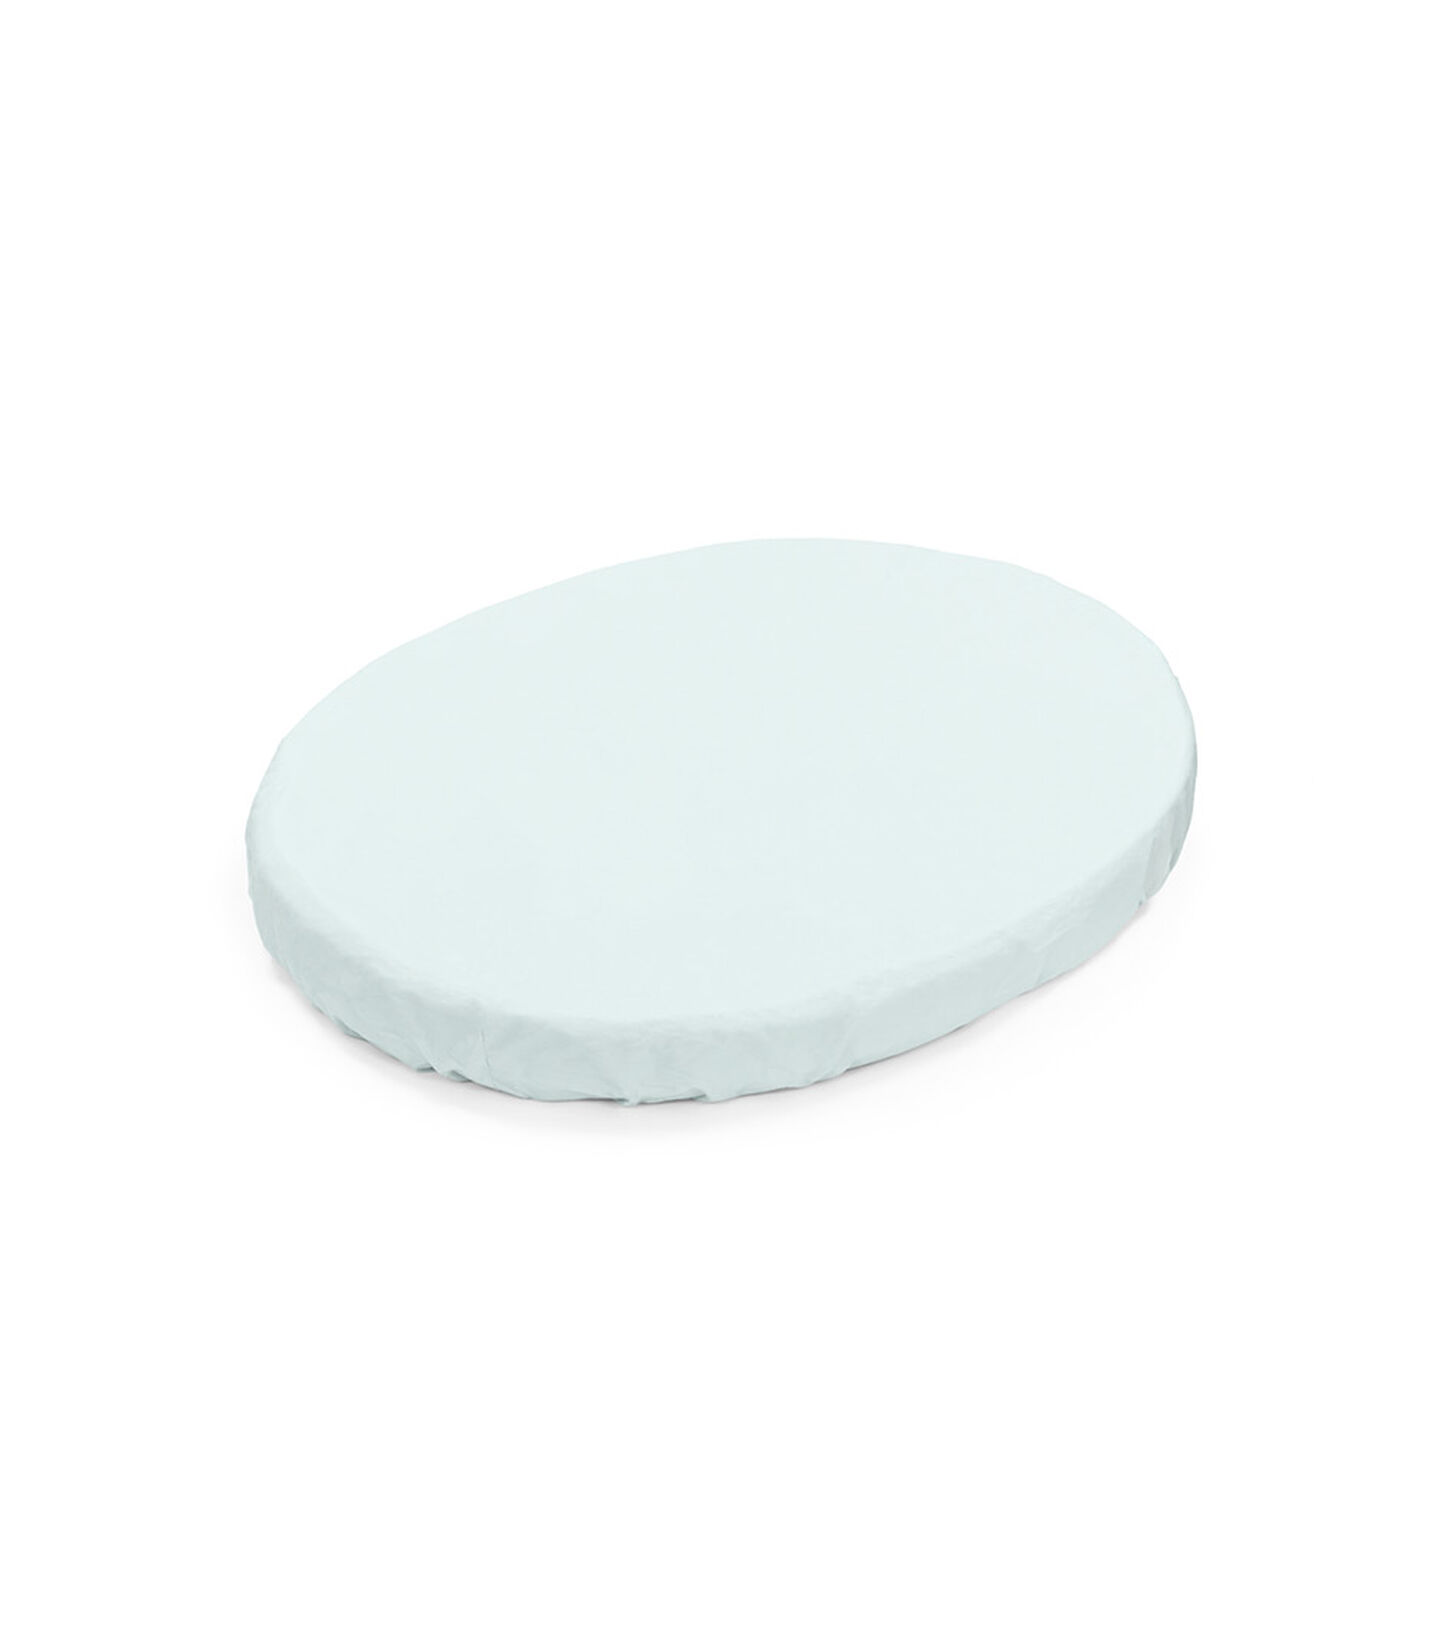 Stokke® Sleepi™ Mini Formsyet lagen Powder Blue, Powder Blue, mainview view 1